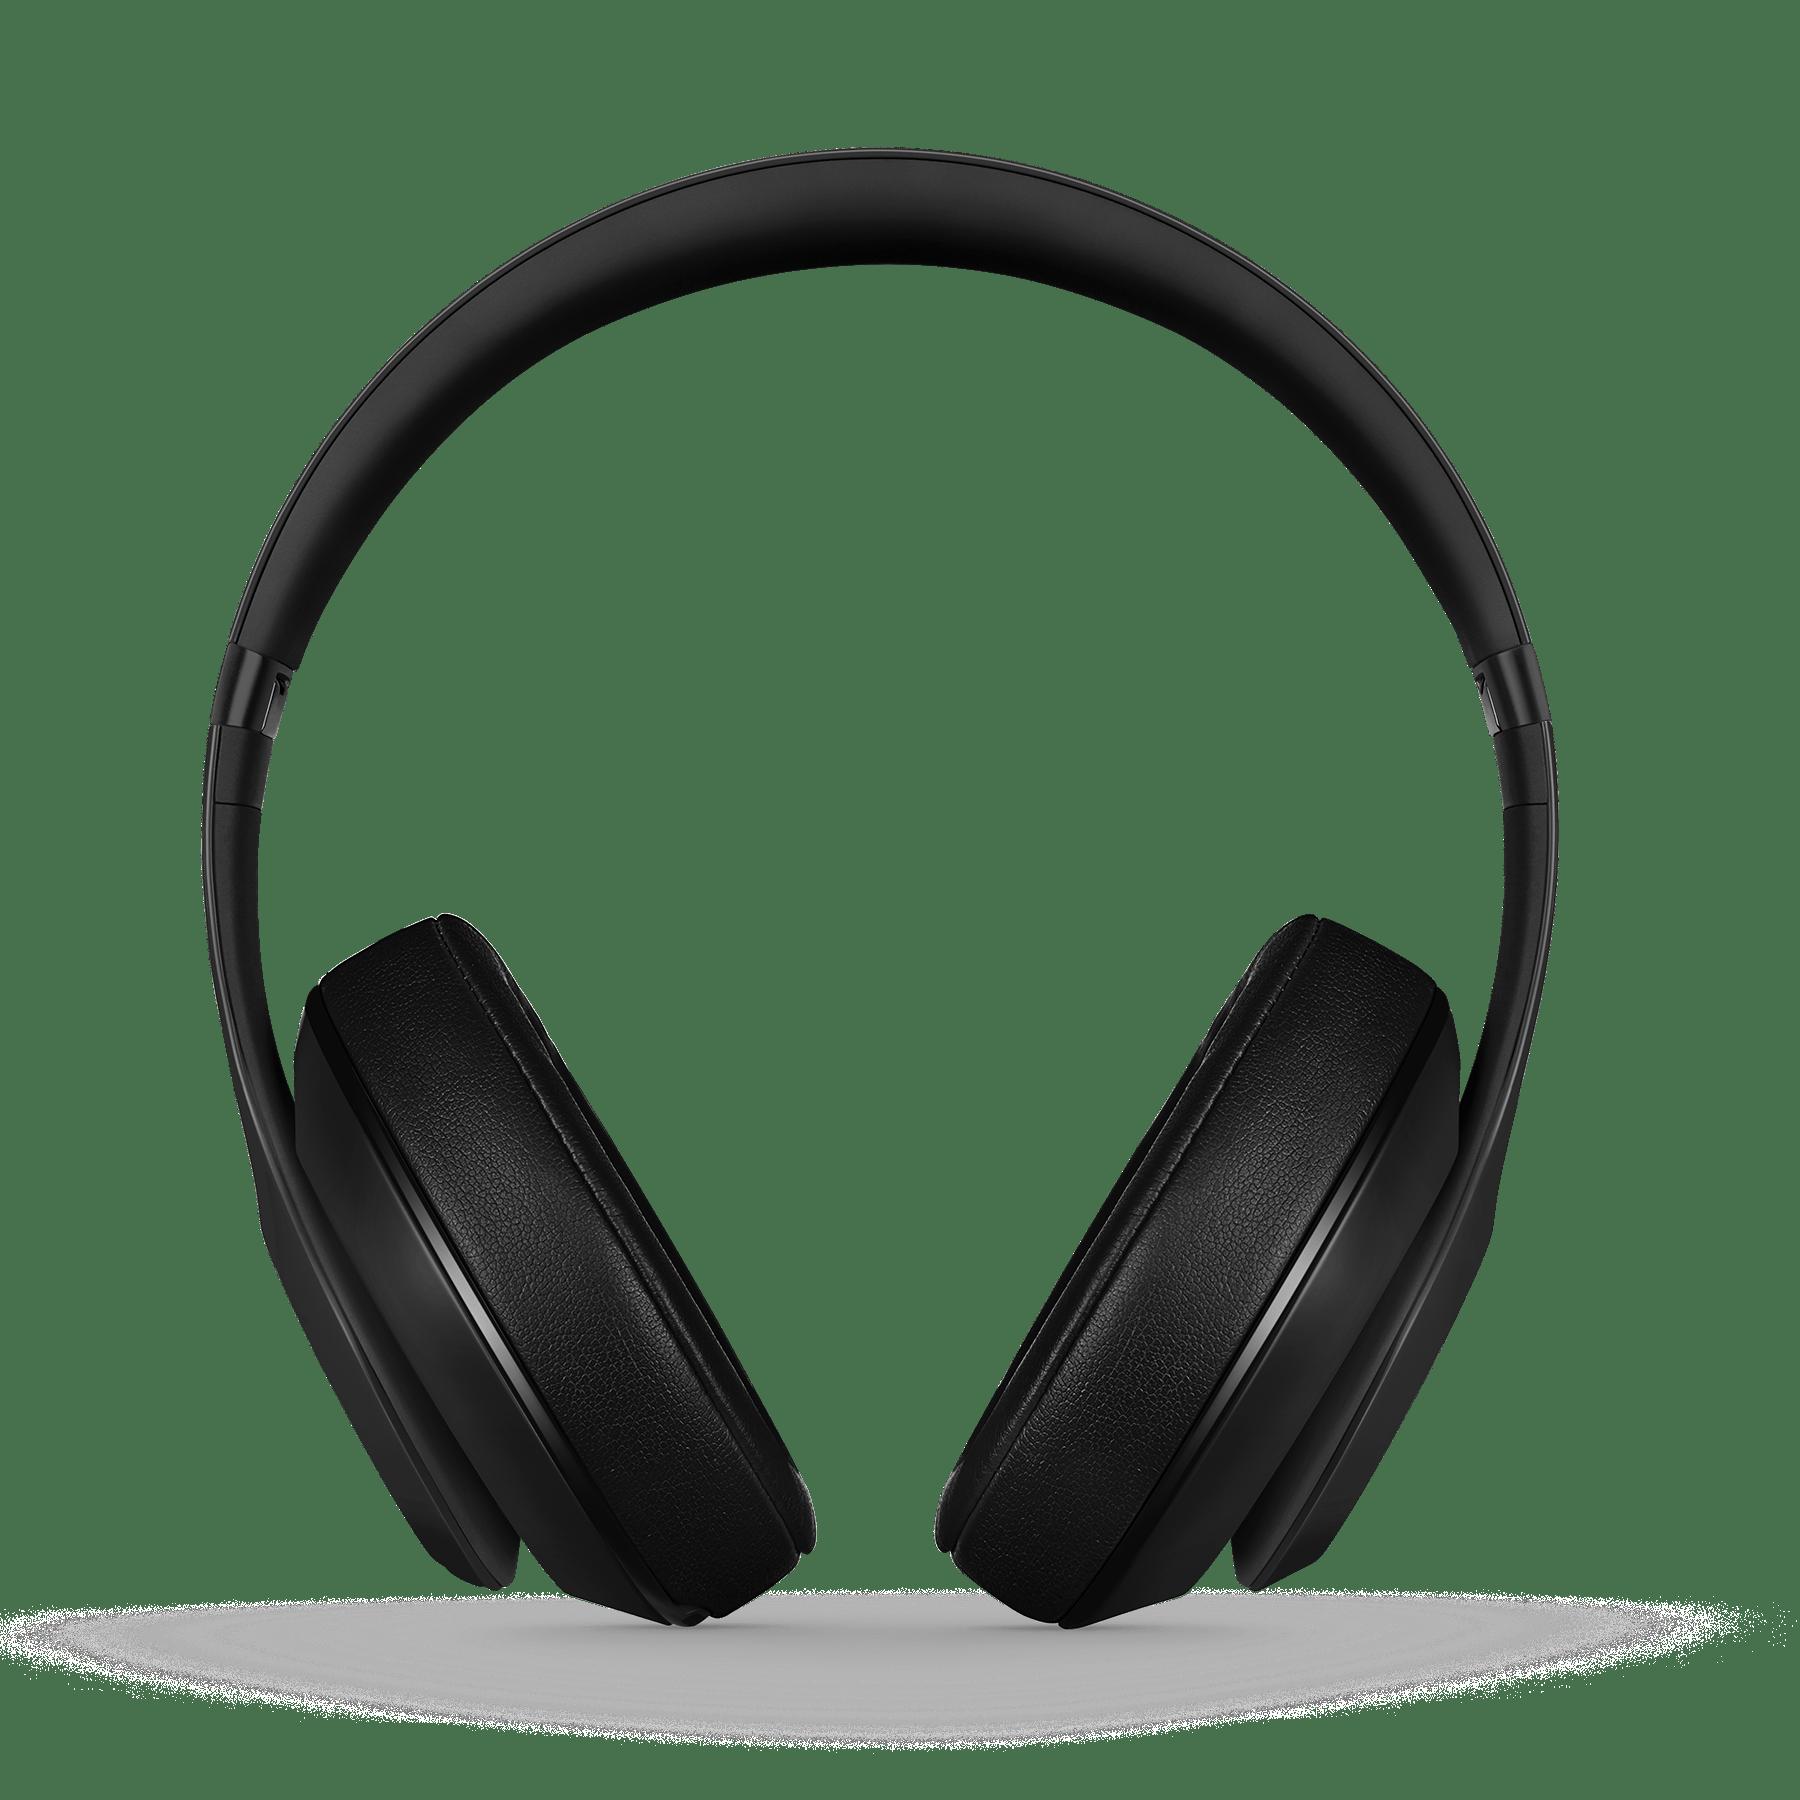 Beats wireless headphones matte gold - wireless headphones beats or apple